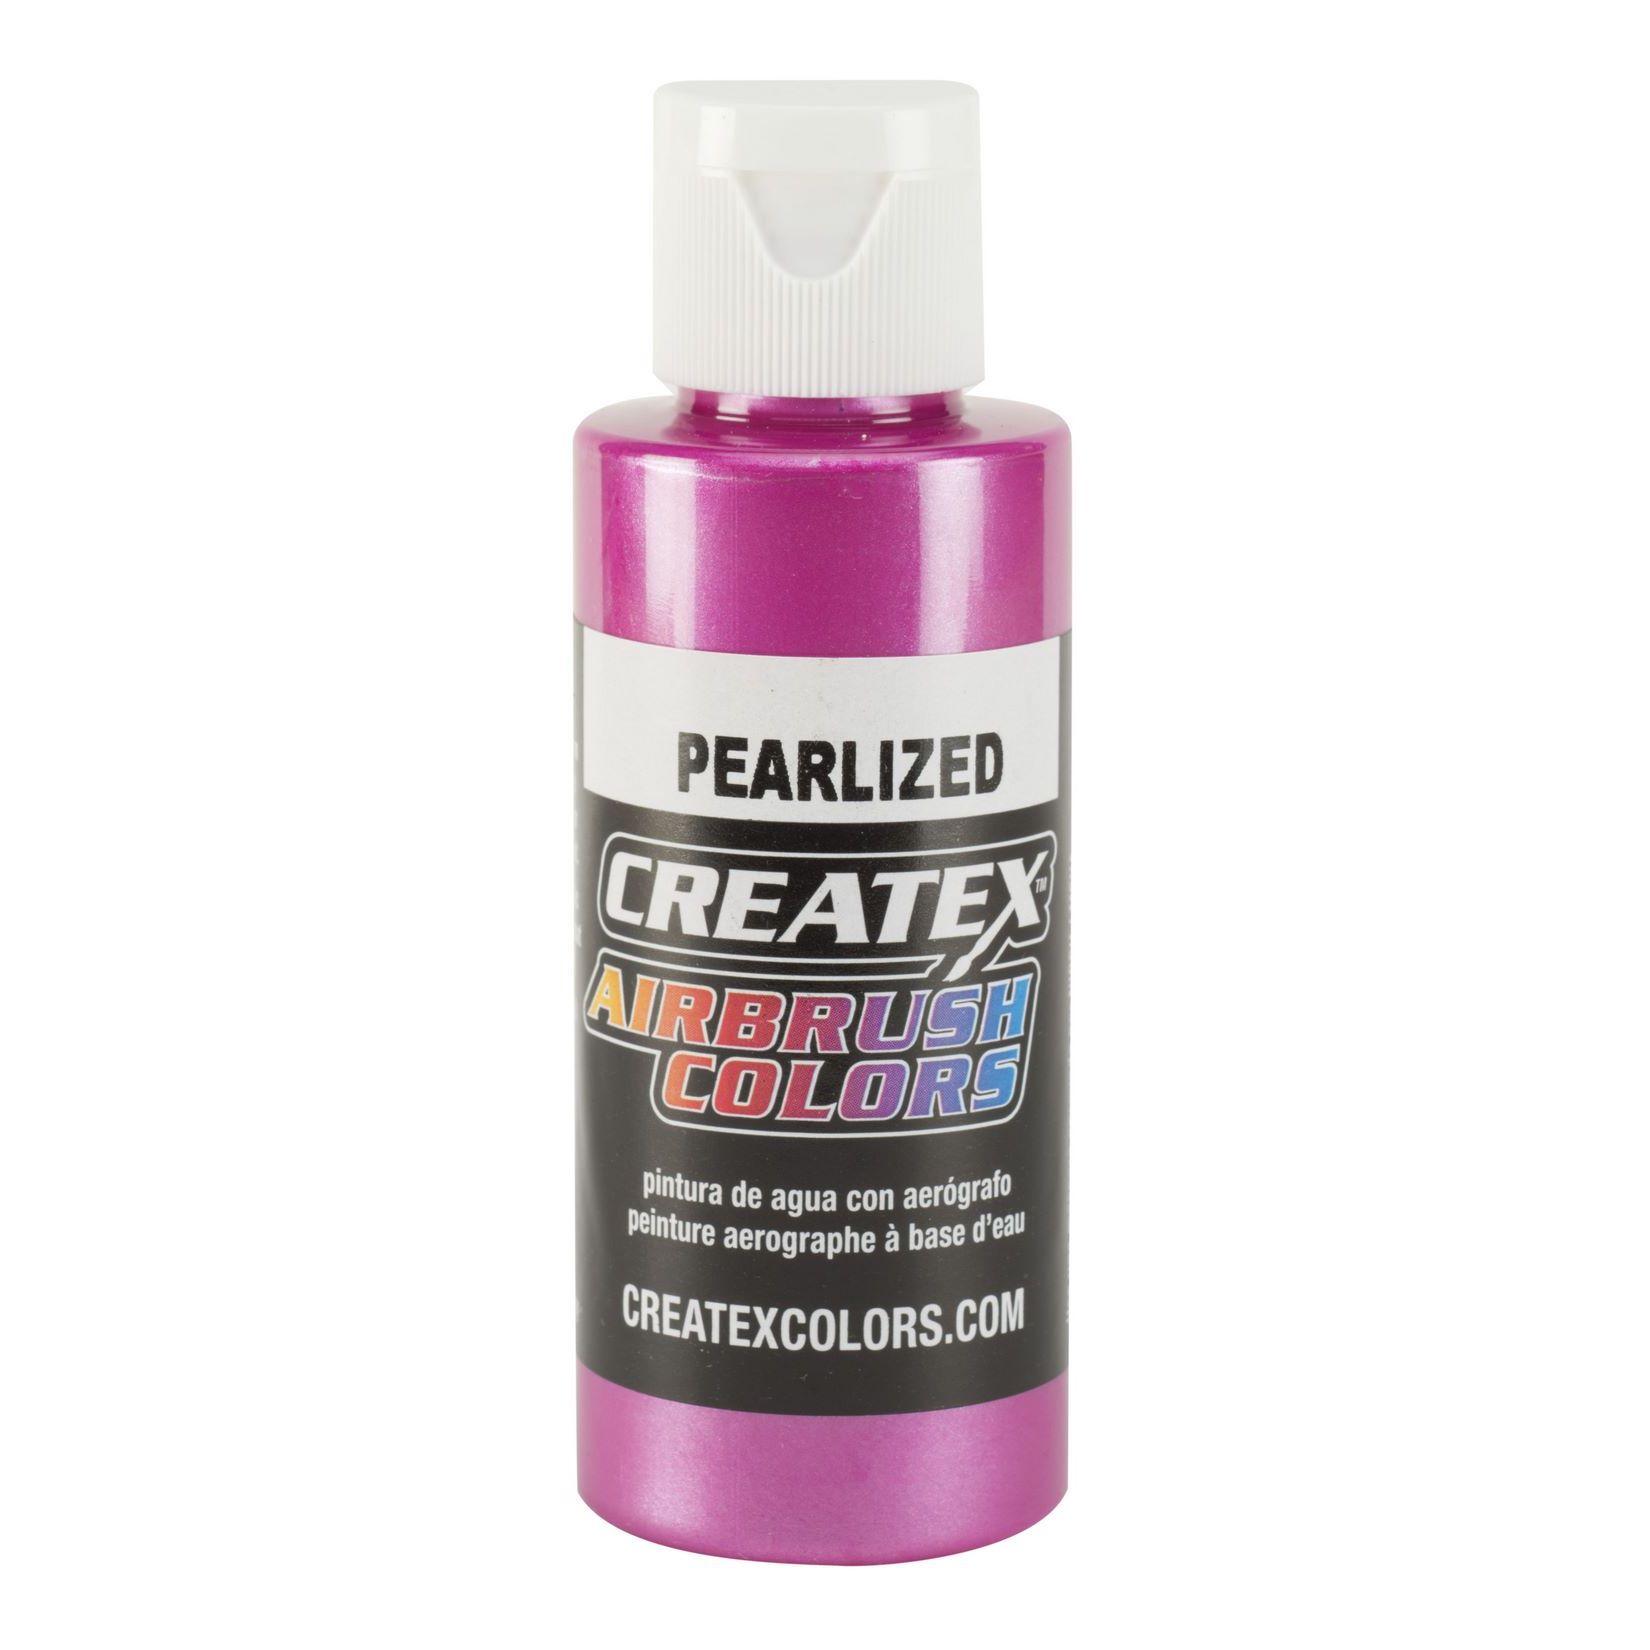 pearl Magenta Createx Airbrush Colors Farbe 120ml 12 5302 Createx